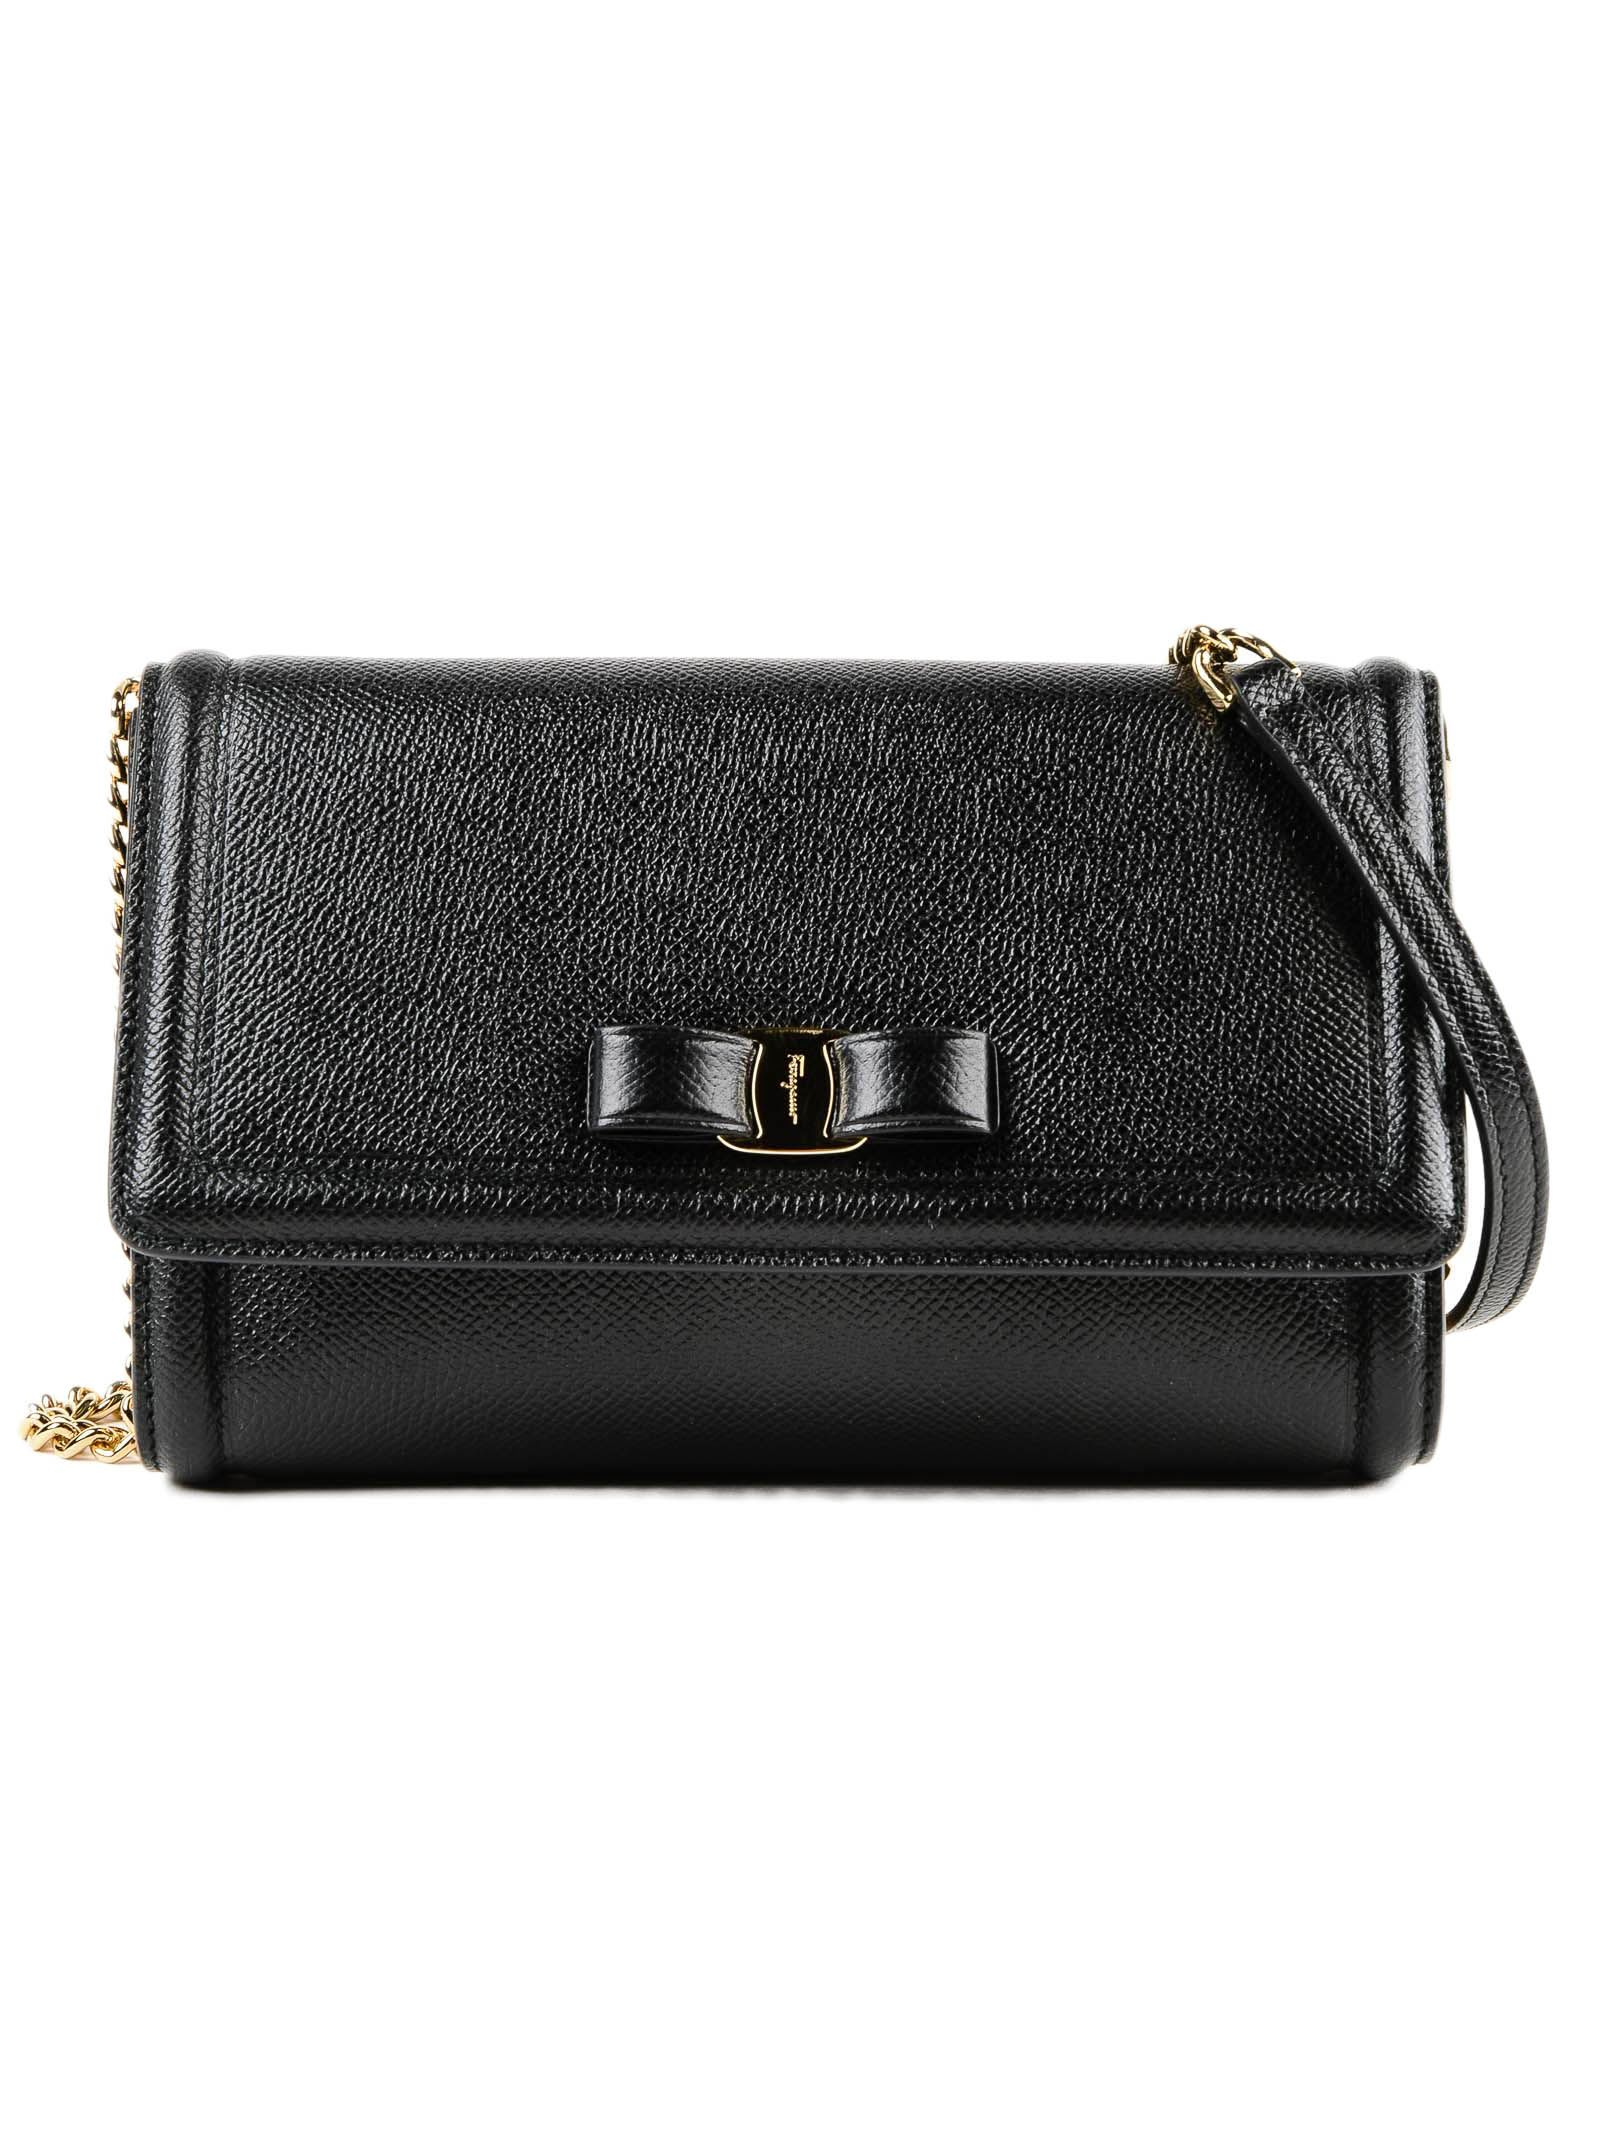 df1e74894f7e Salvatore Ferragamo Vara Shoulder Bag - Nero ...